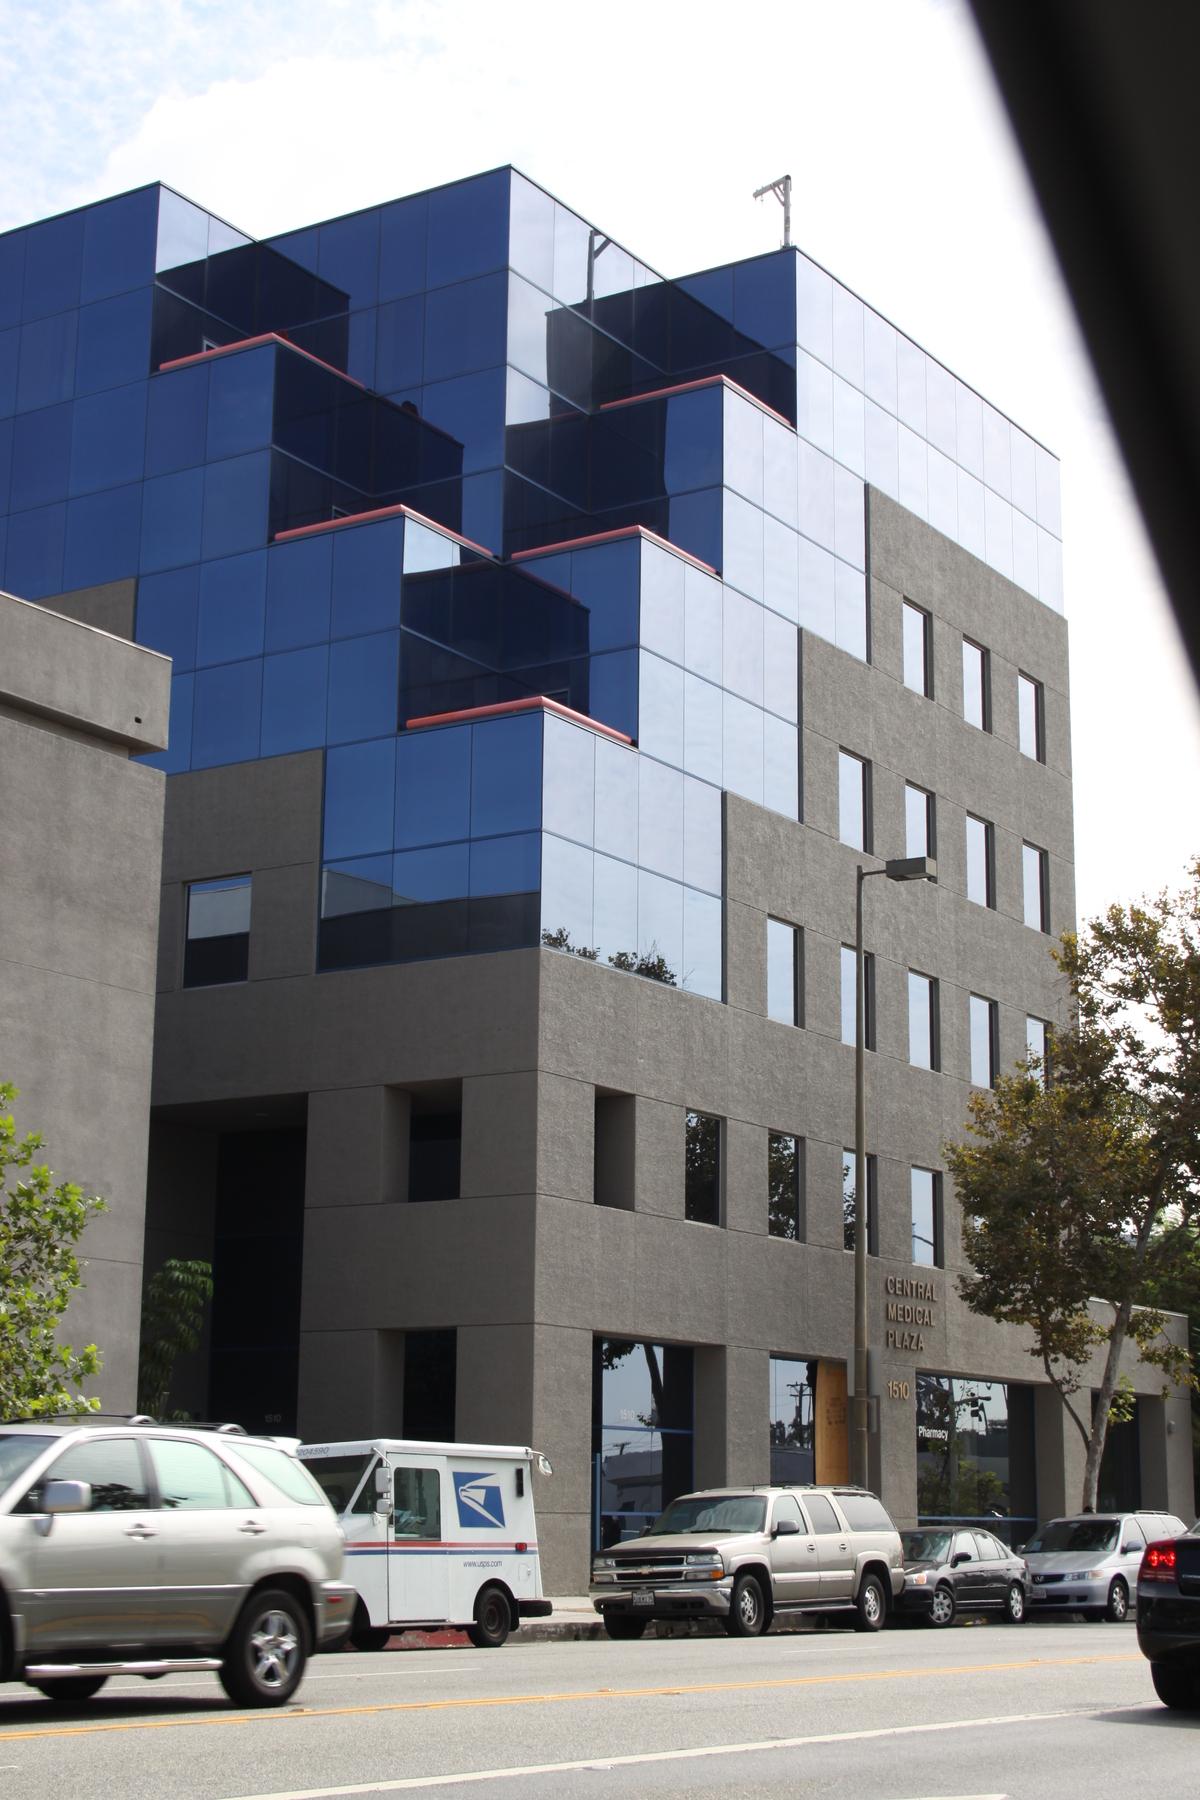 Glendale Memorial Hospital Medical Office Building II